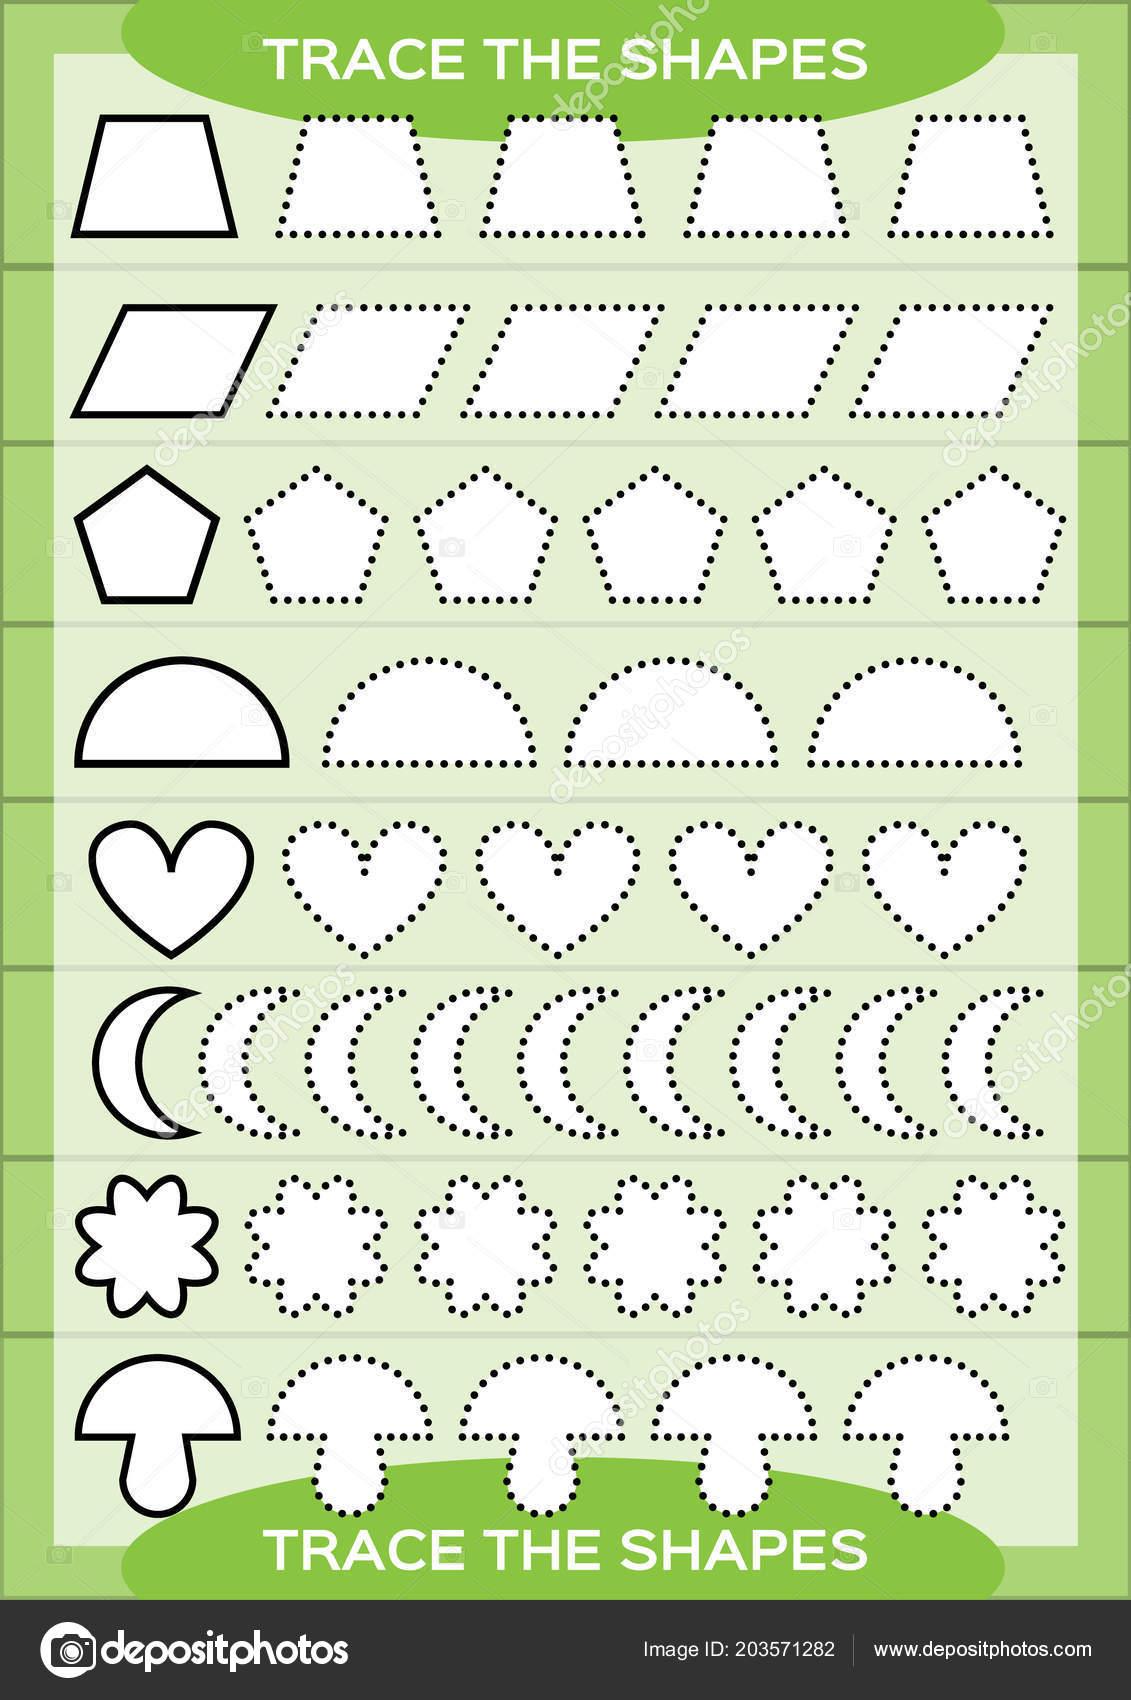 Trace Shapes Kids Education Preschool Worksheet Basic Writing Kids